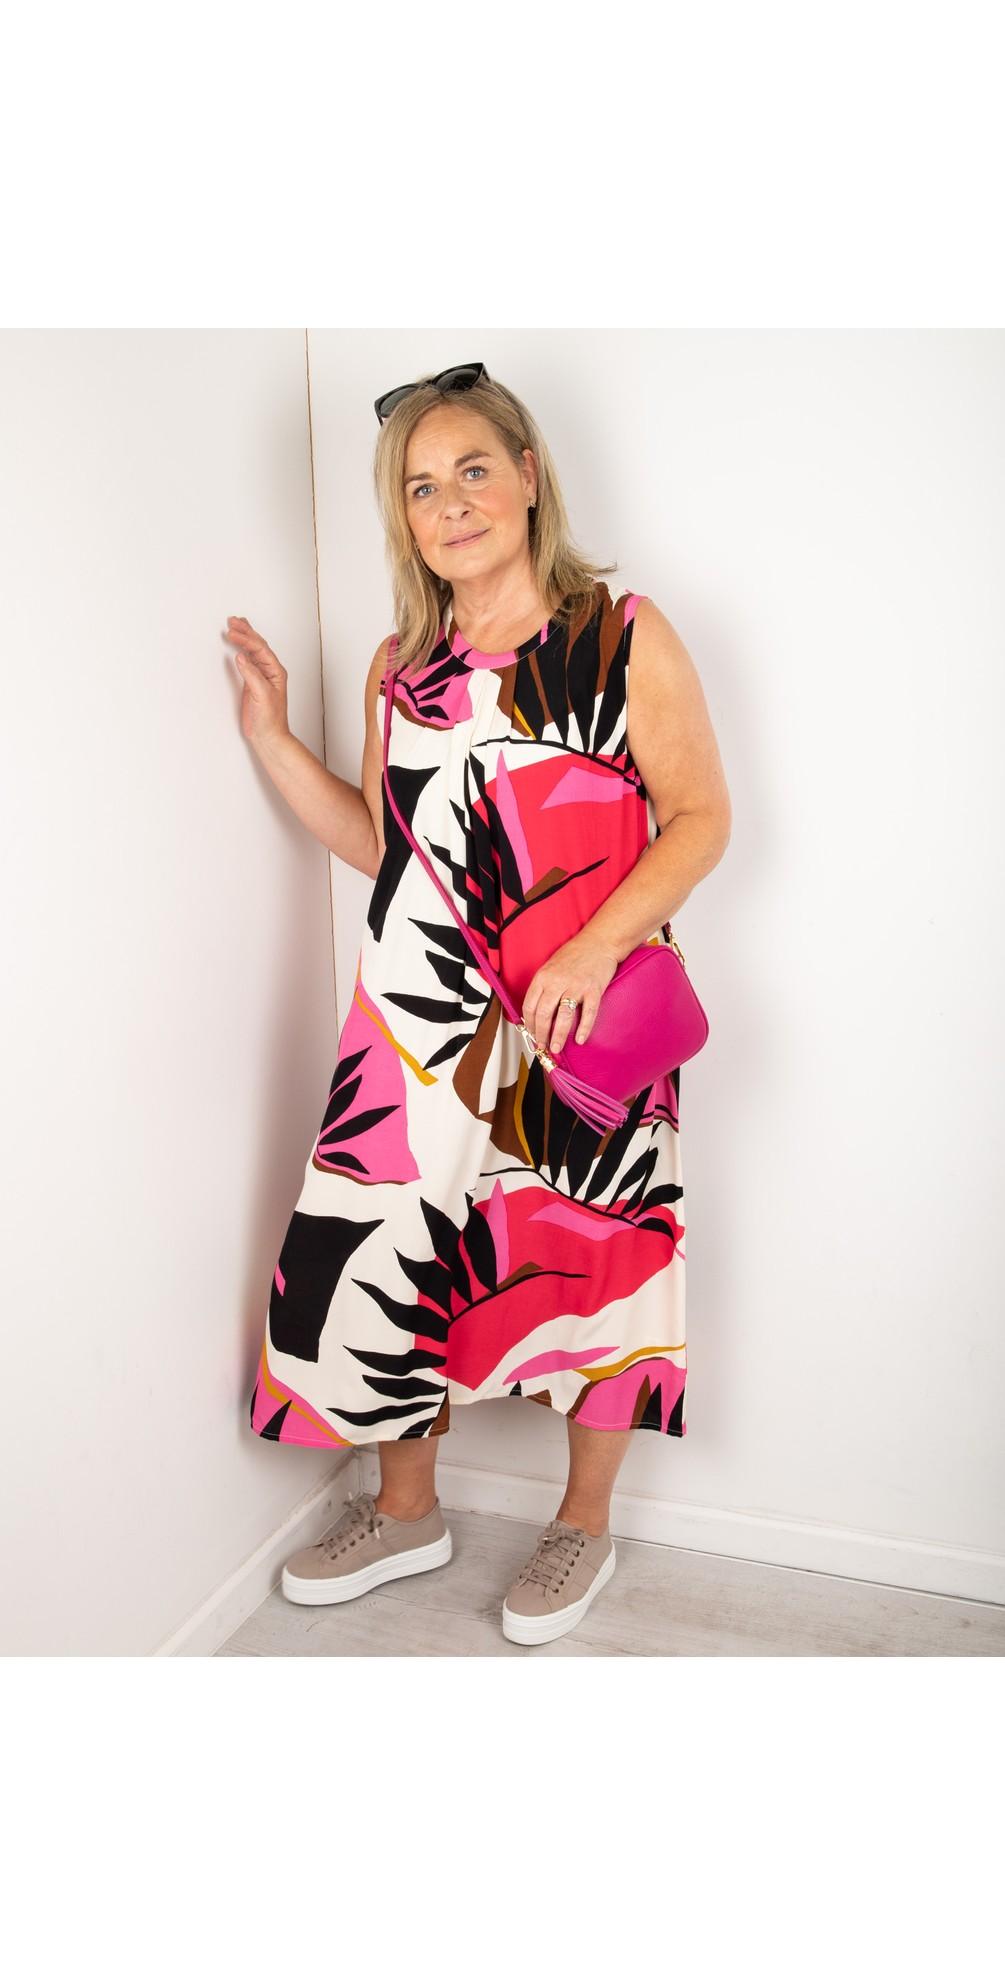 Olasa Dress main image